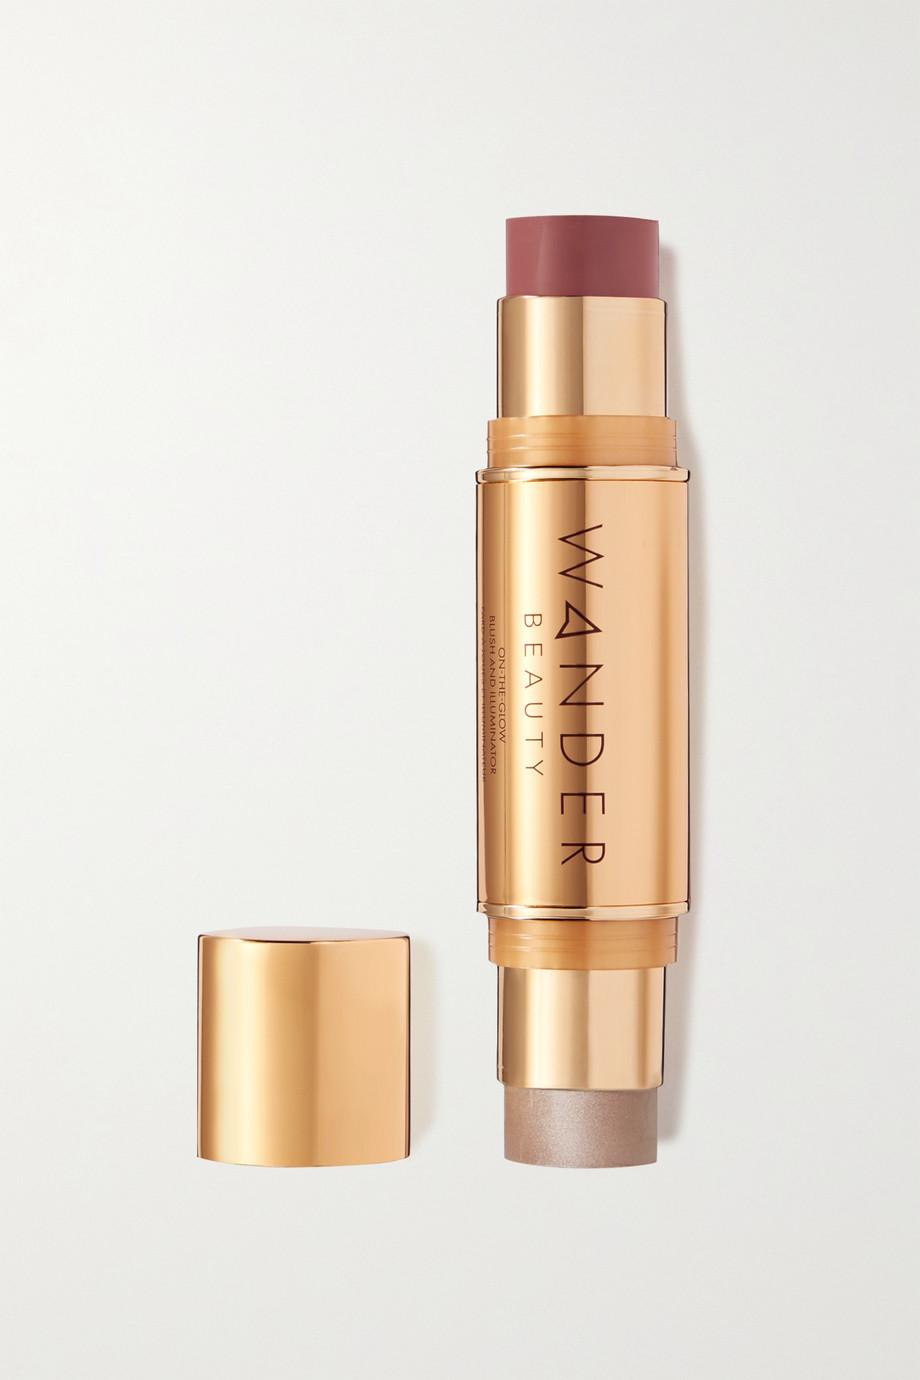 Wander Beauty Blush et illuminateur On-the-Glow, Berry Whisper